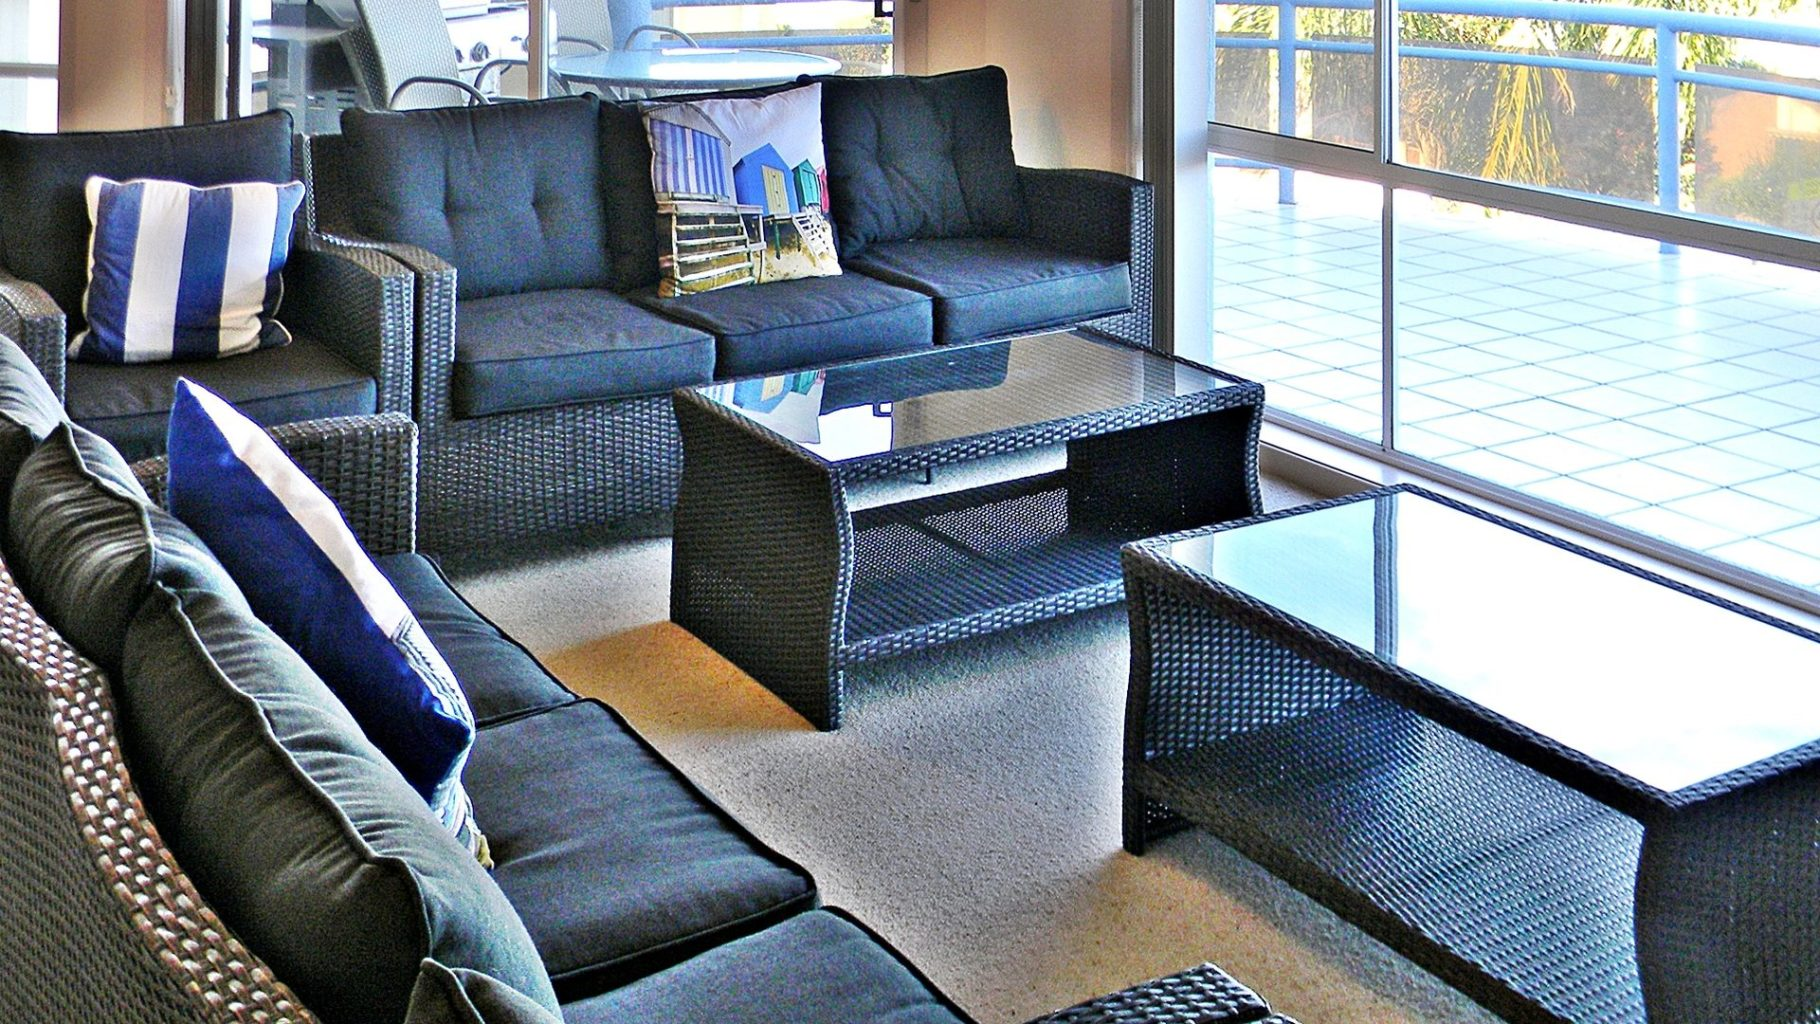 Quays 6 lounge 2